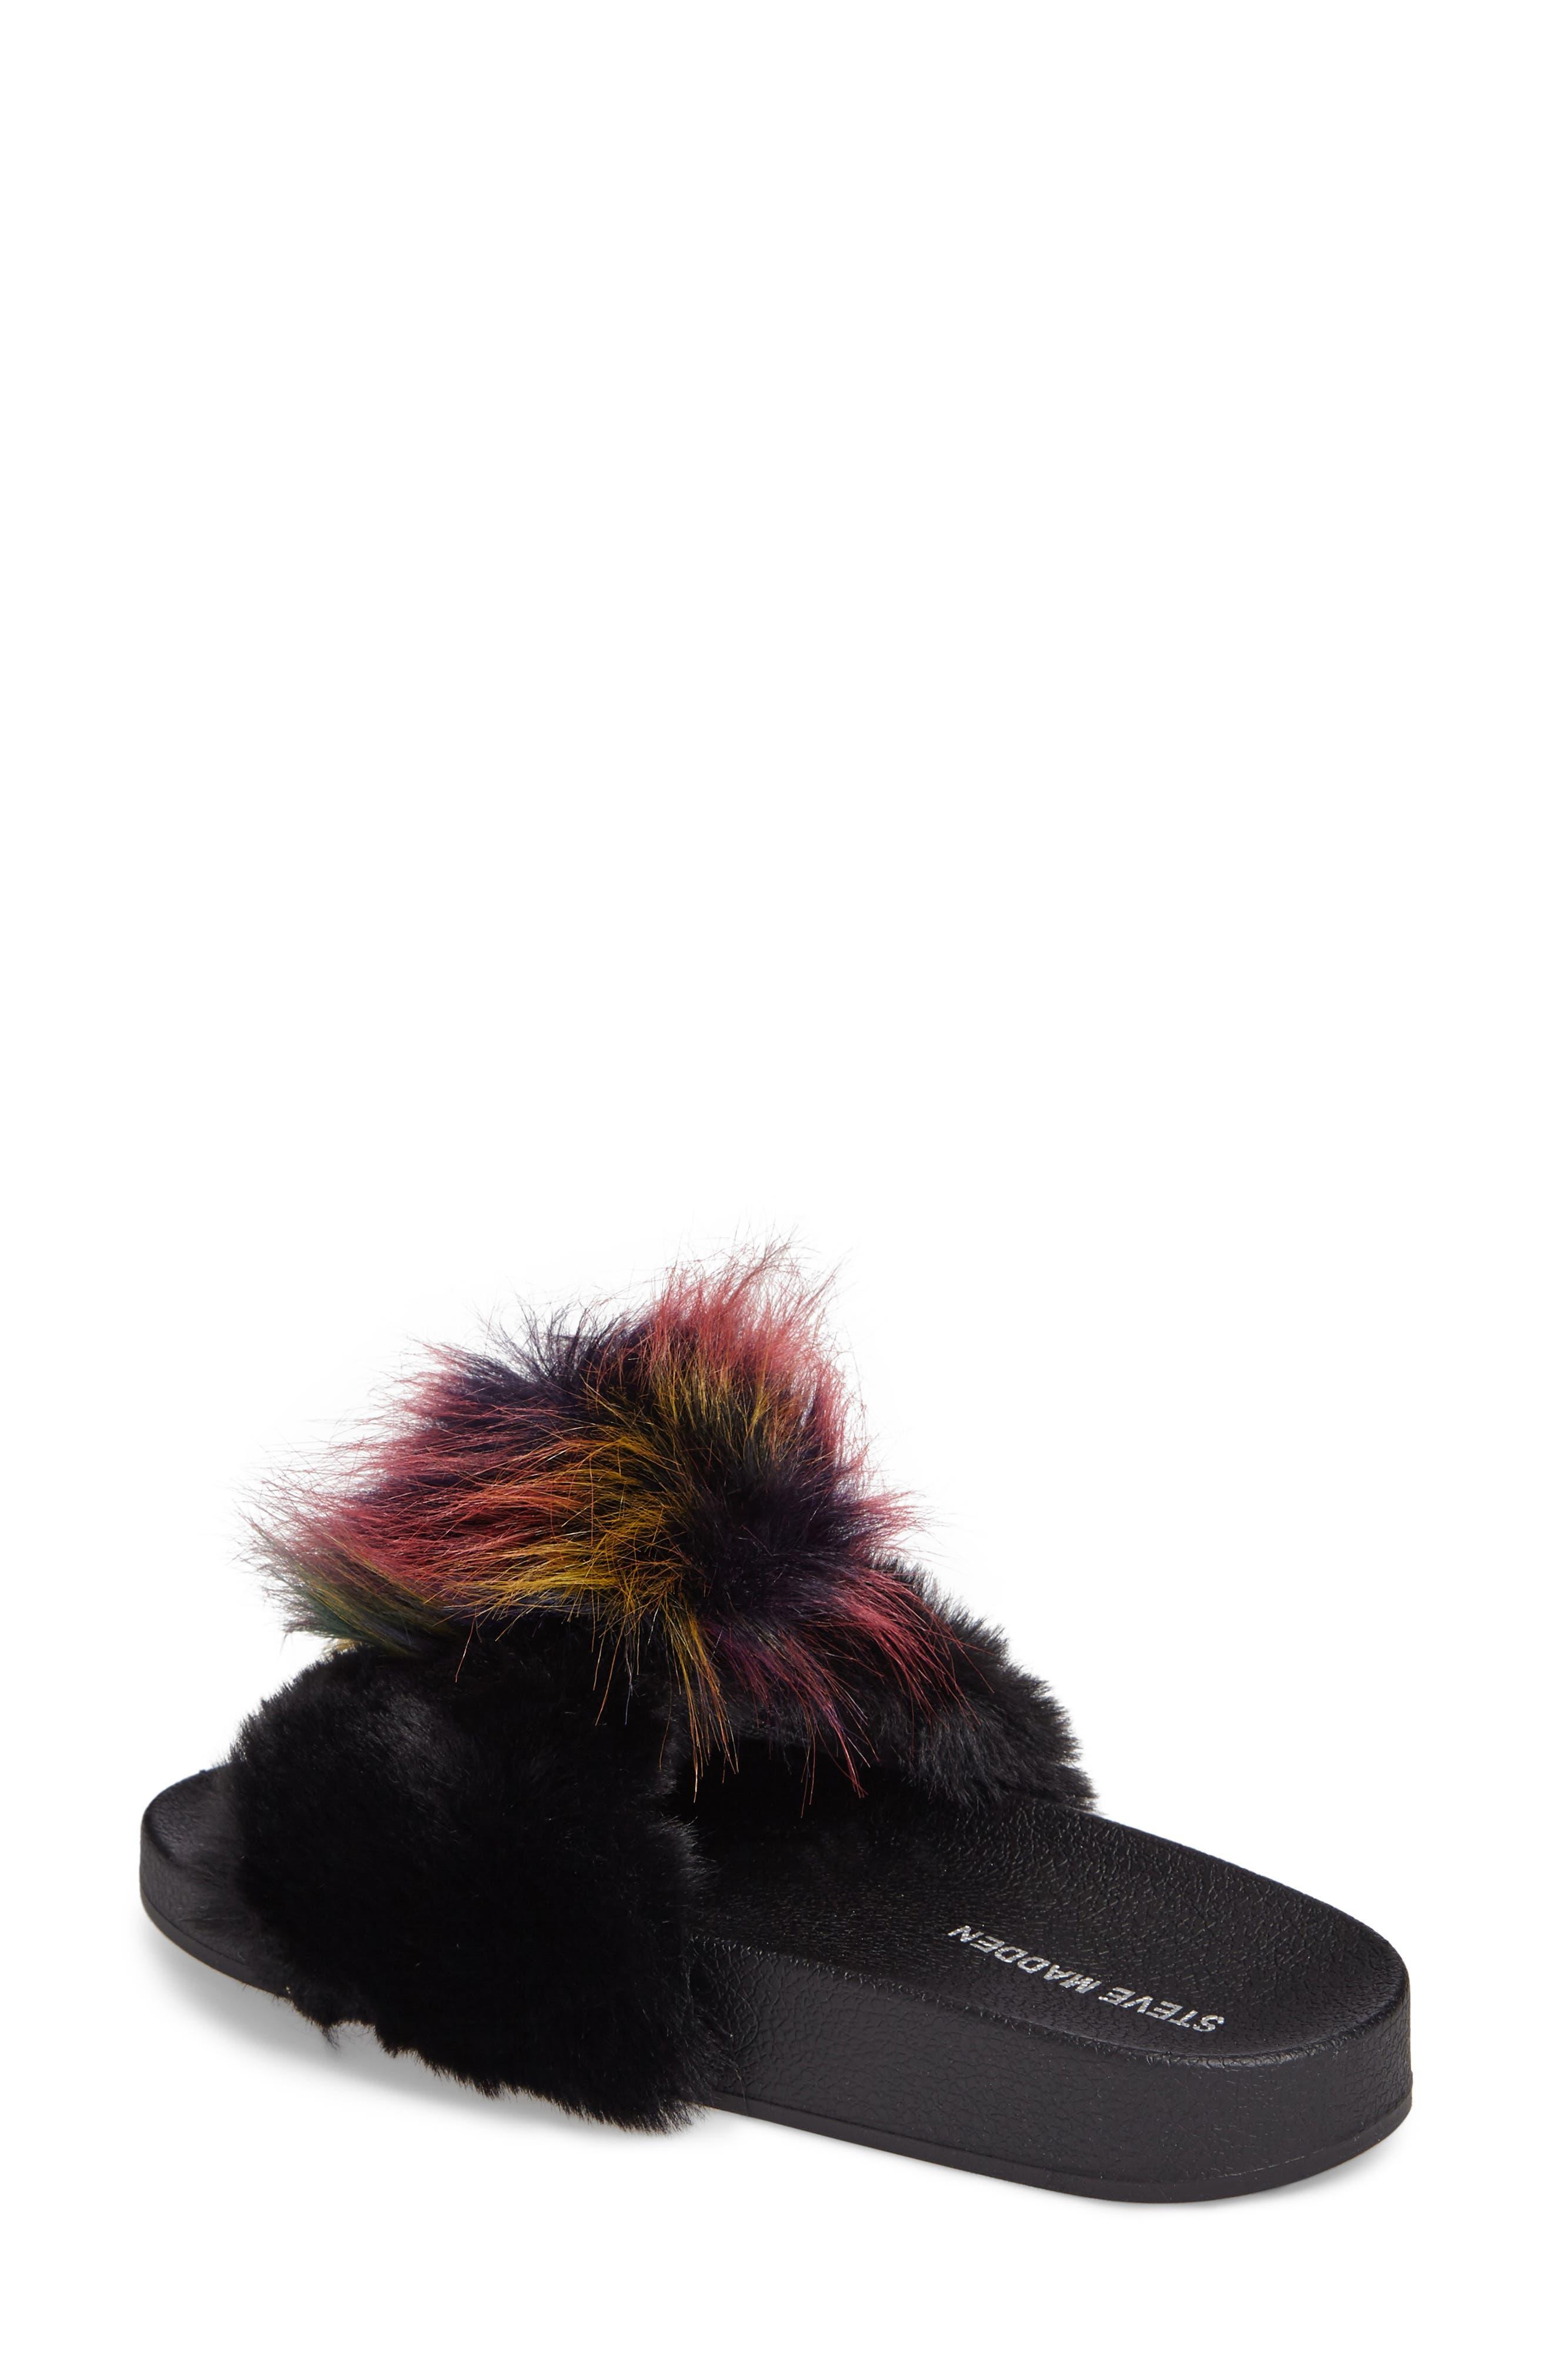 Spiral Faux Fur Slide Sandal,                             Alternate thumbnail 2, color,                             Black Multi